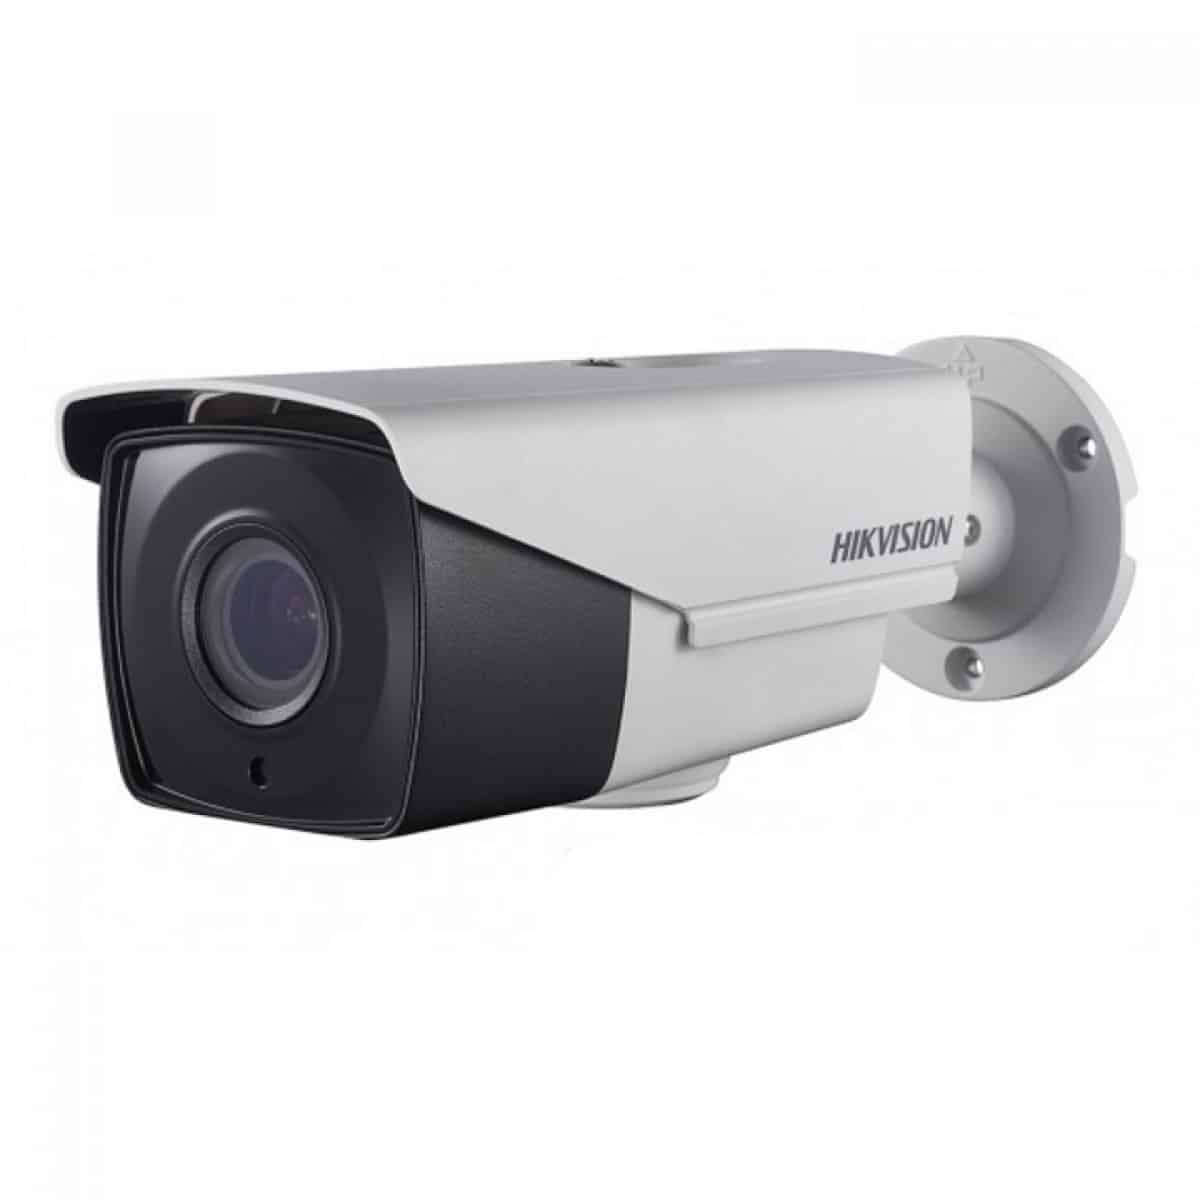 Hikvision DS-2CE16D7T–AIT3Z HD1080P WDR Motorized VF EXIR Bullet Camera